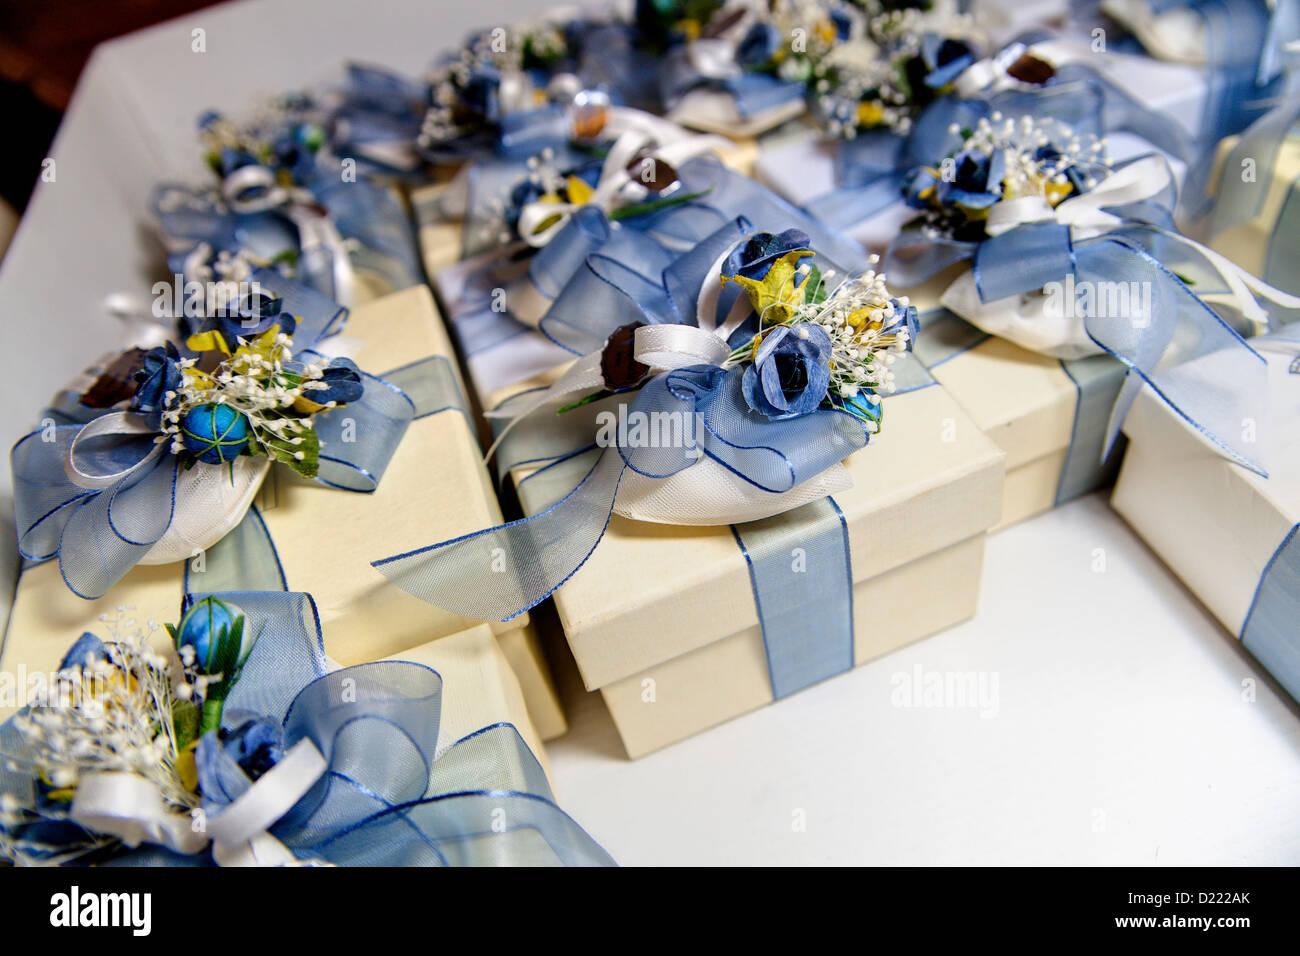 Wedding presents - Stock Image